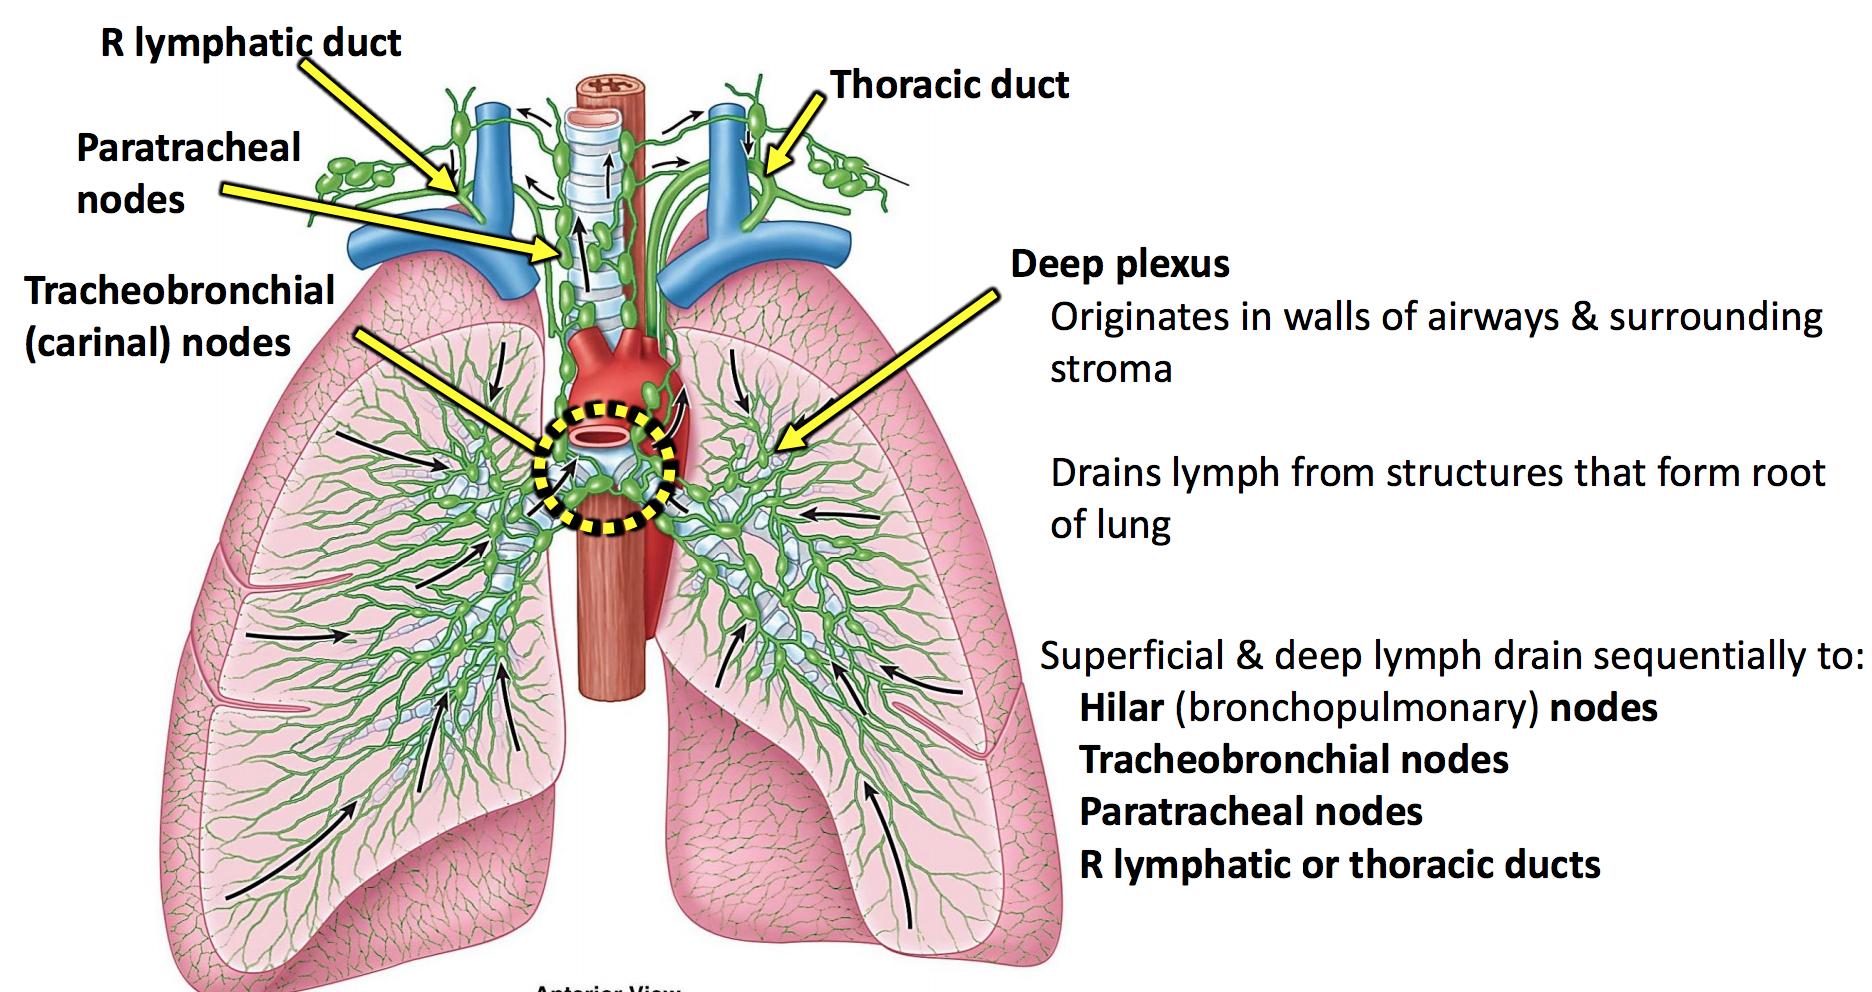 GS G21 Lungs & Pleura (ANATG UNIT 3) Flashcards | Memorang